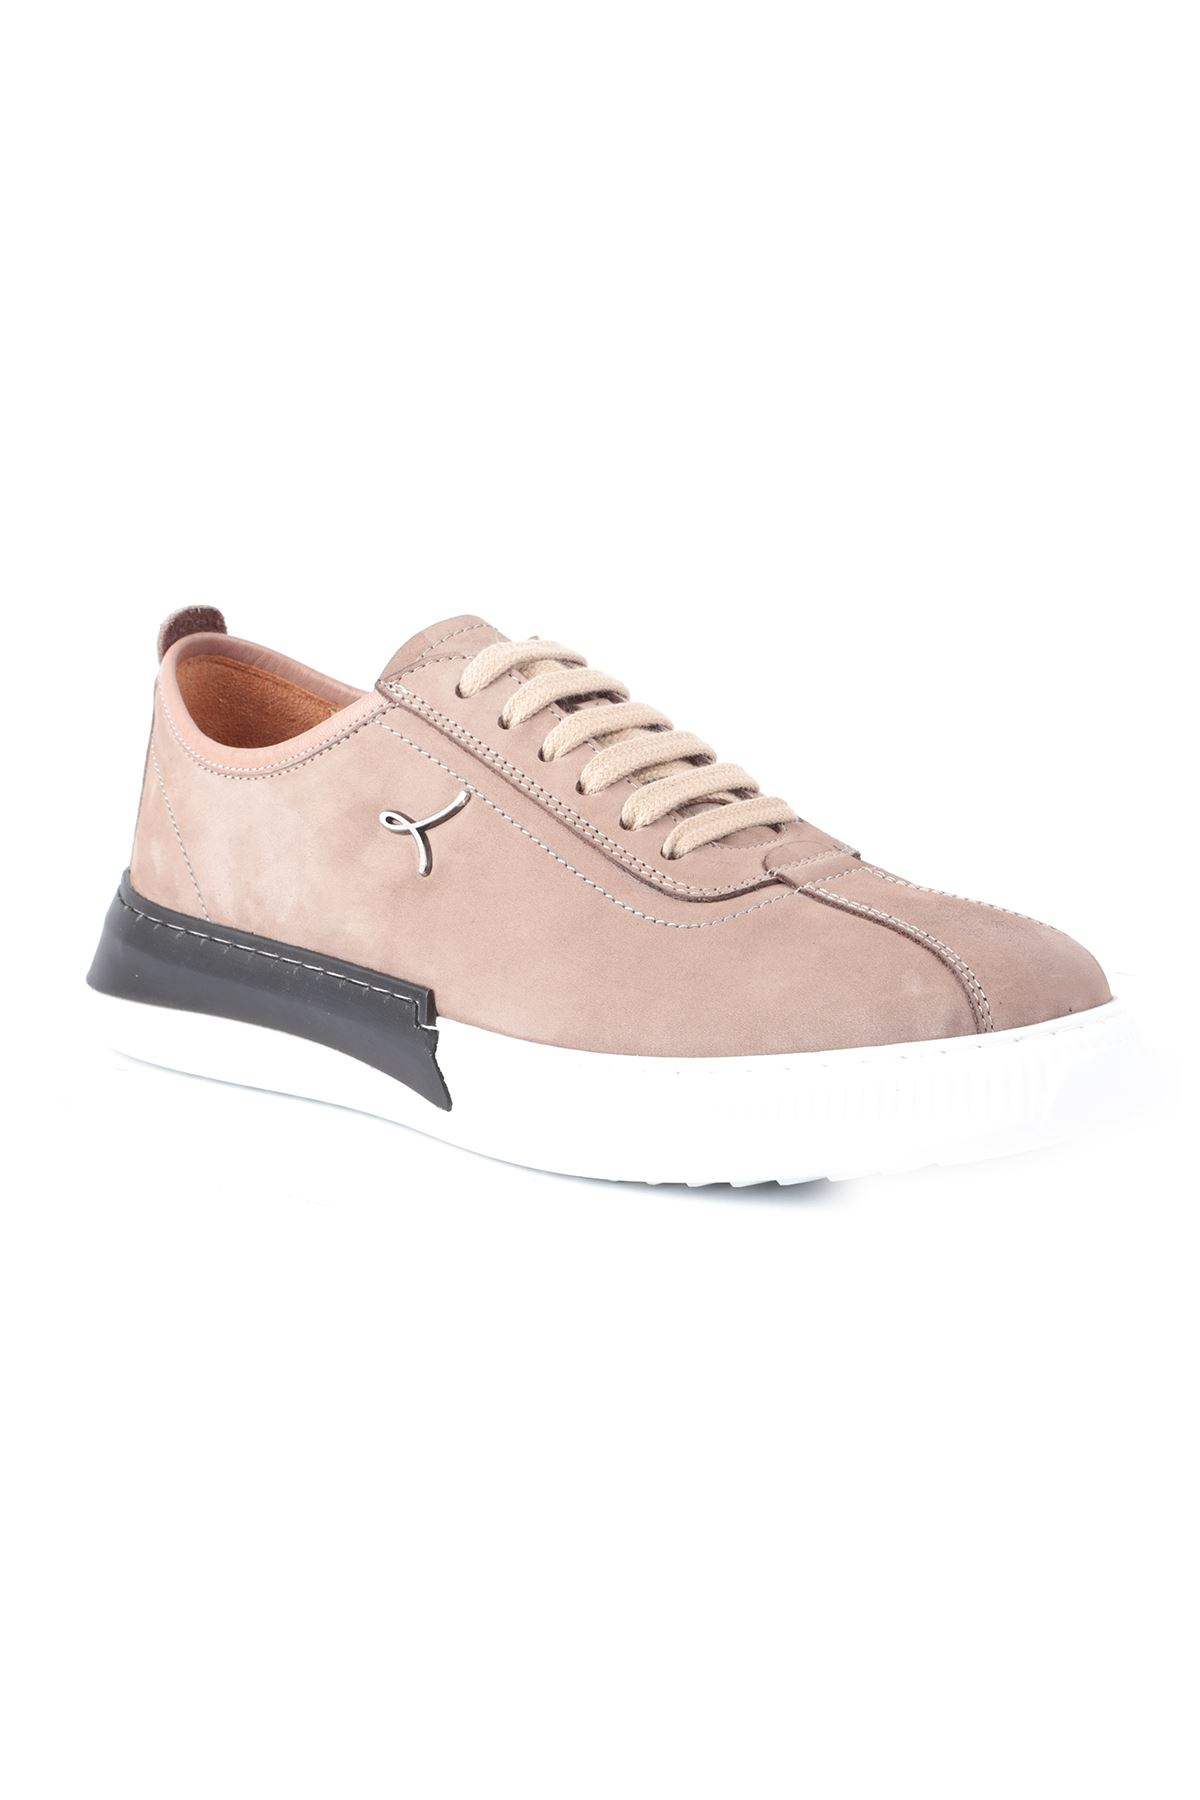 Libero L3674 Mink Men's Sports Shoes